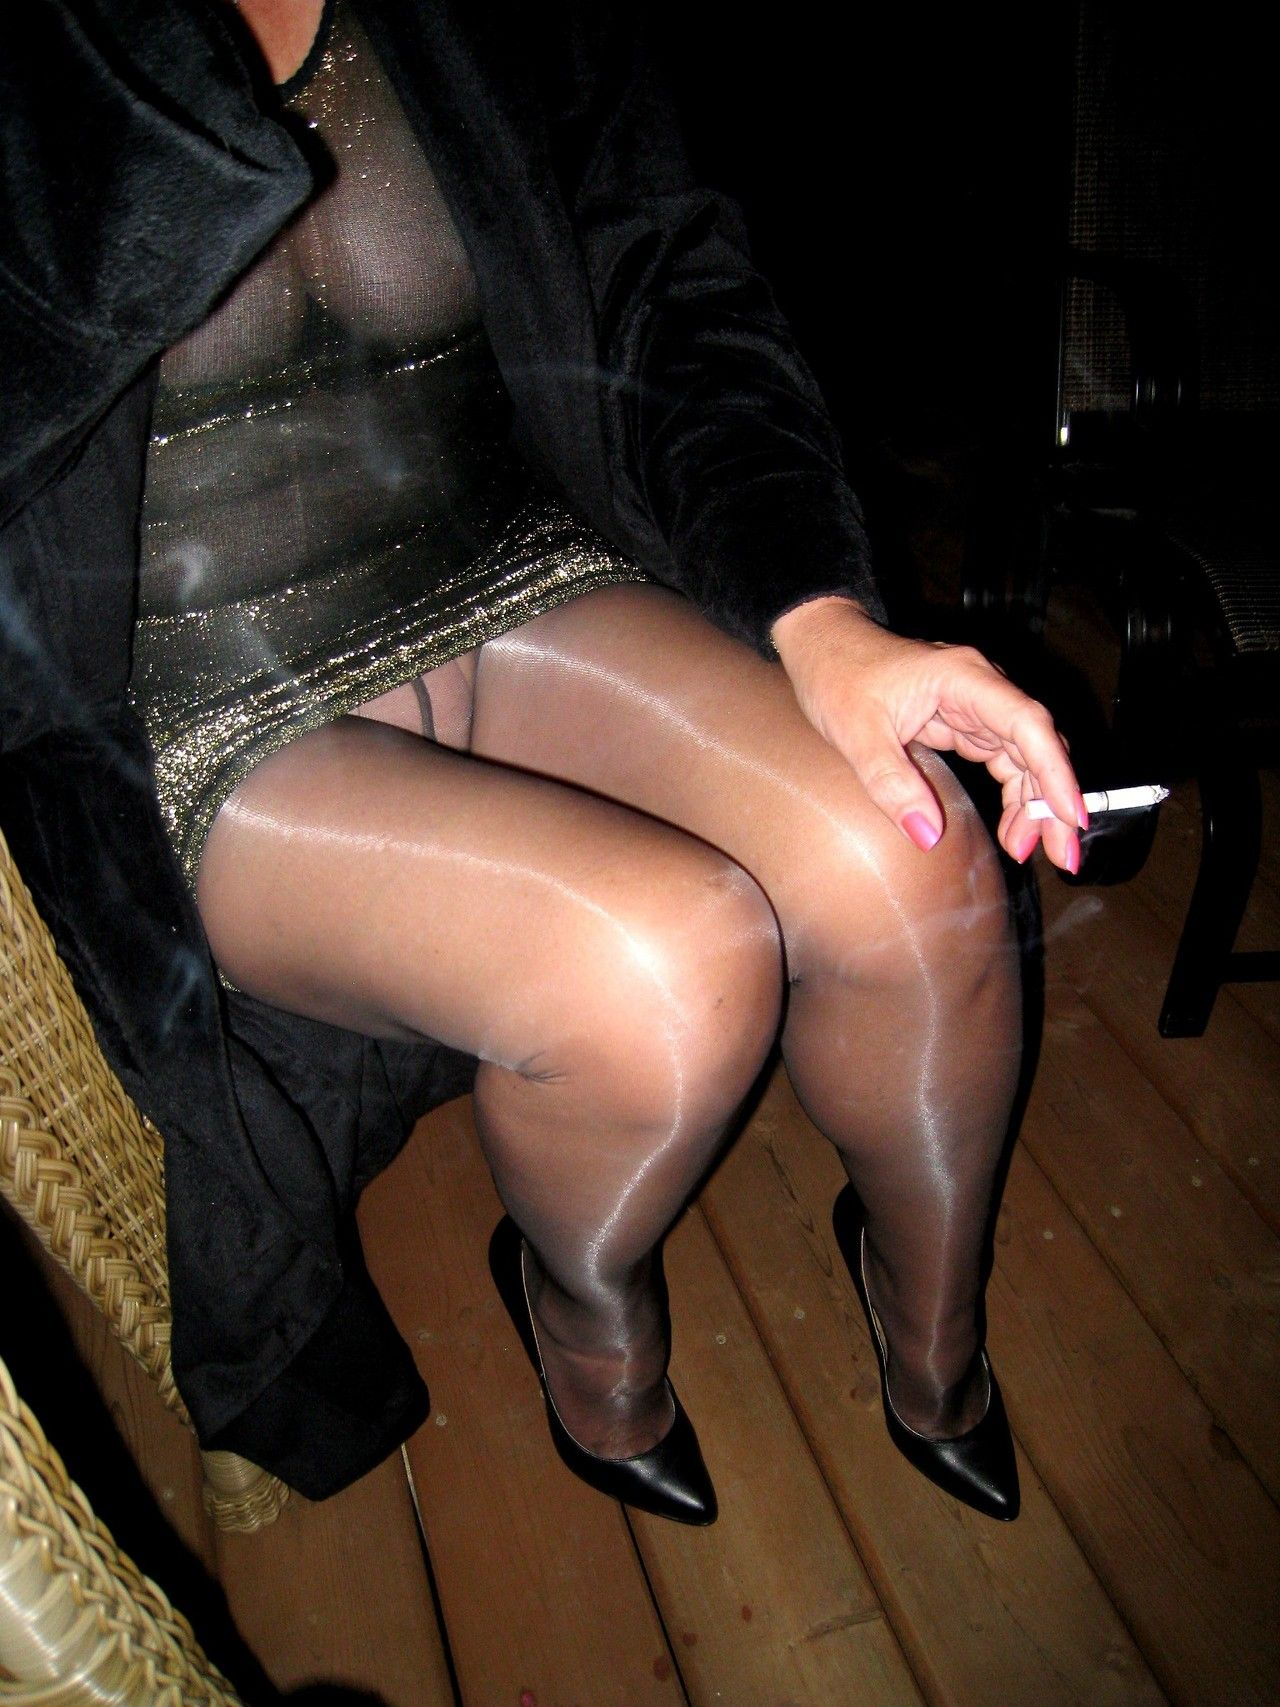 Black shiny pantyhose heels skirt